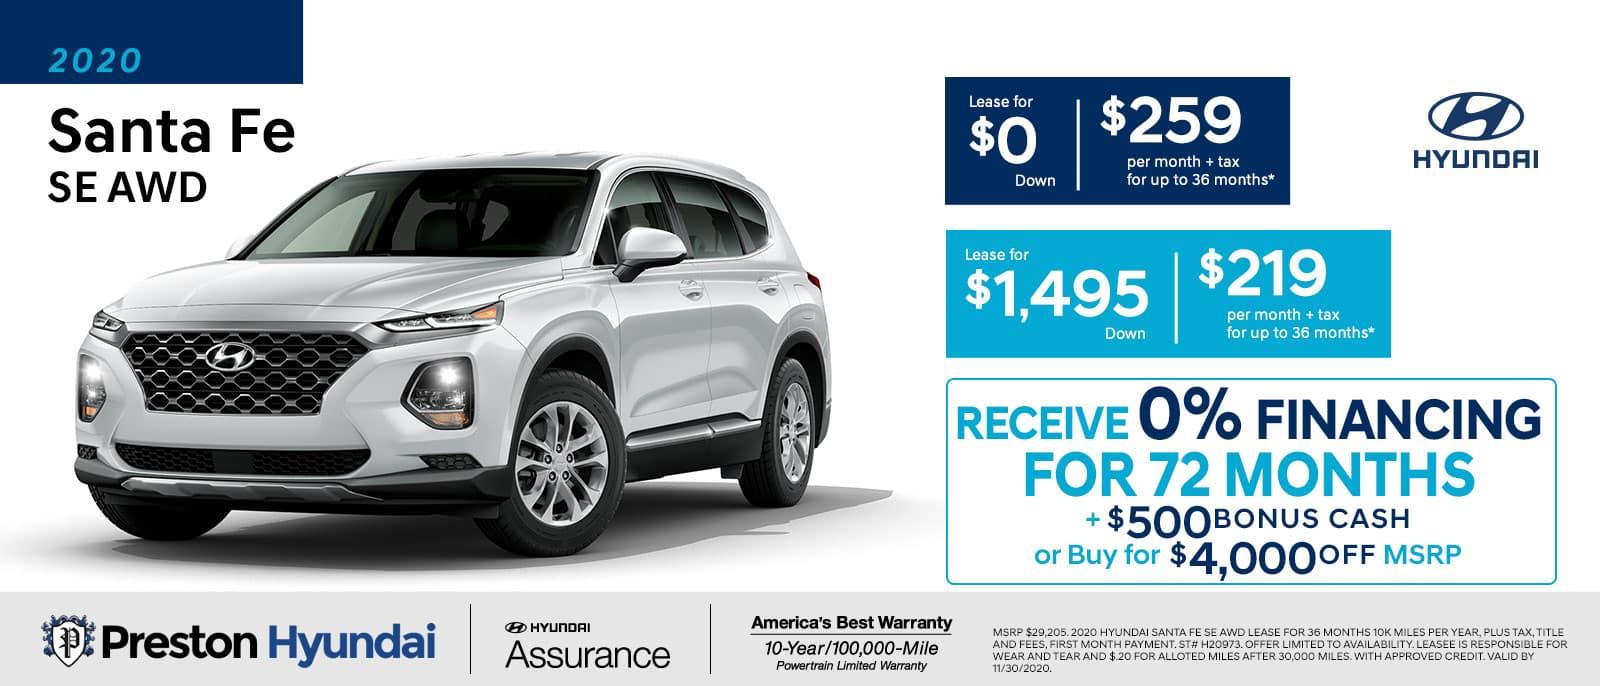 November special on the 2020 Hyundai Santa Fe